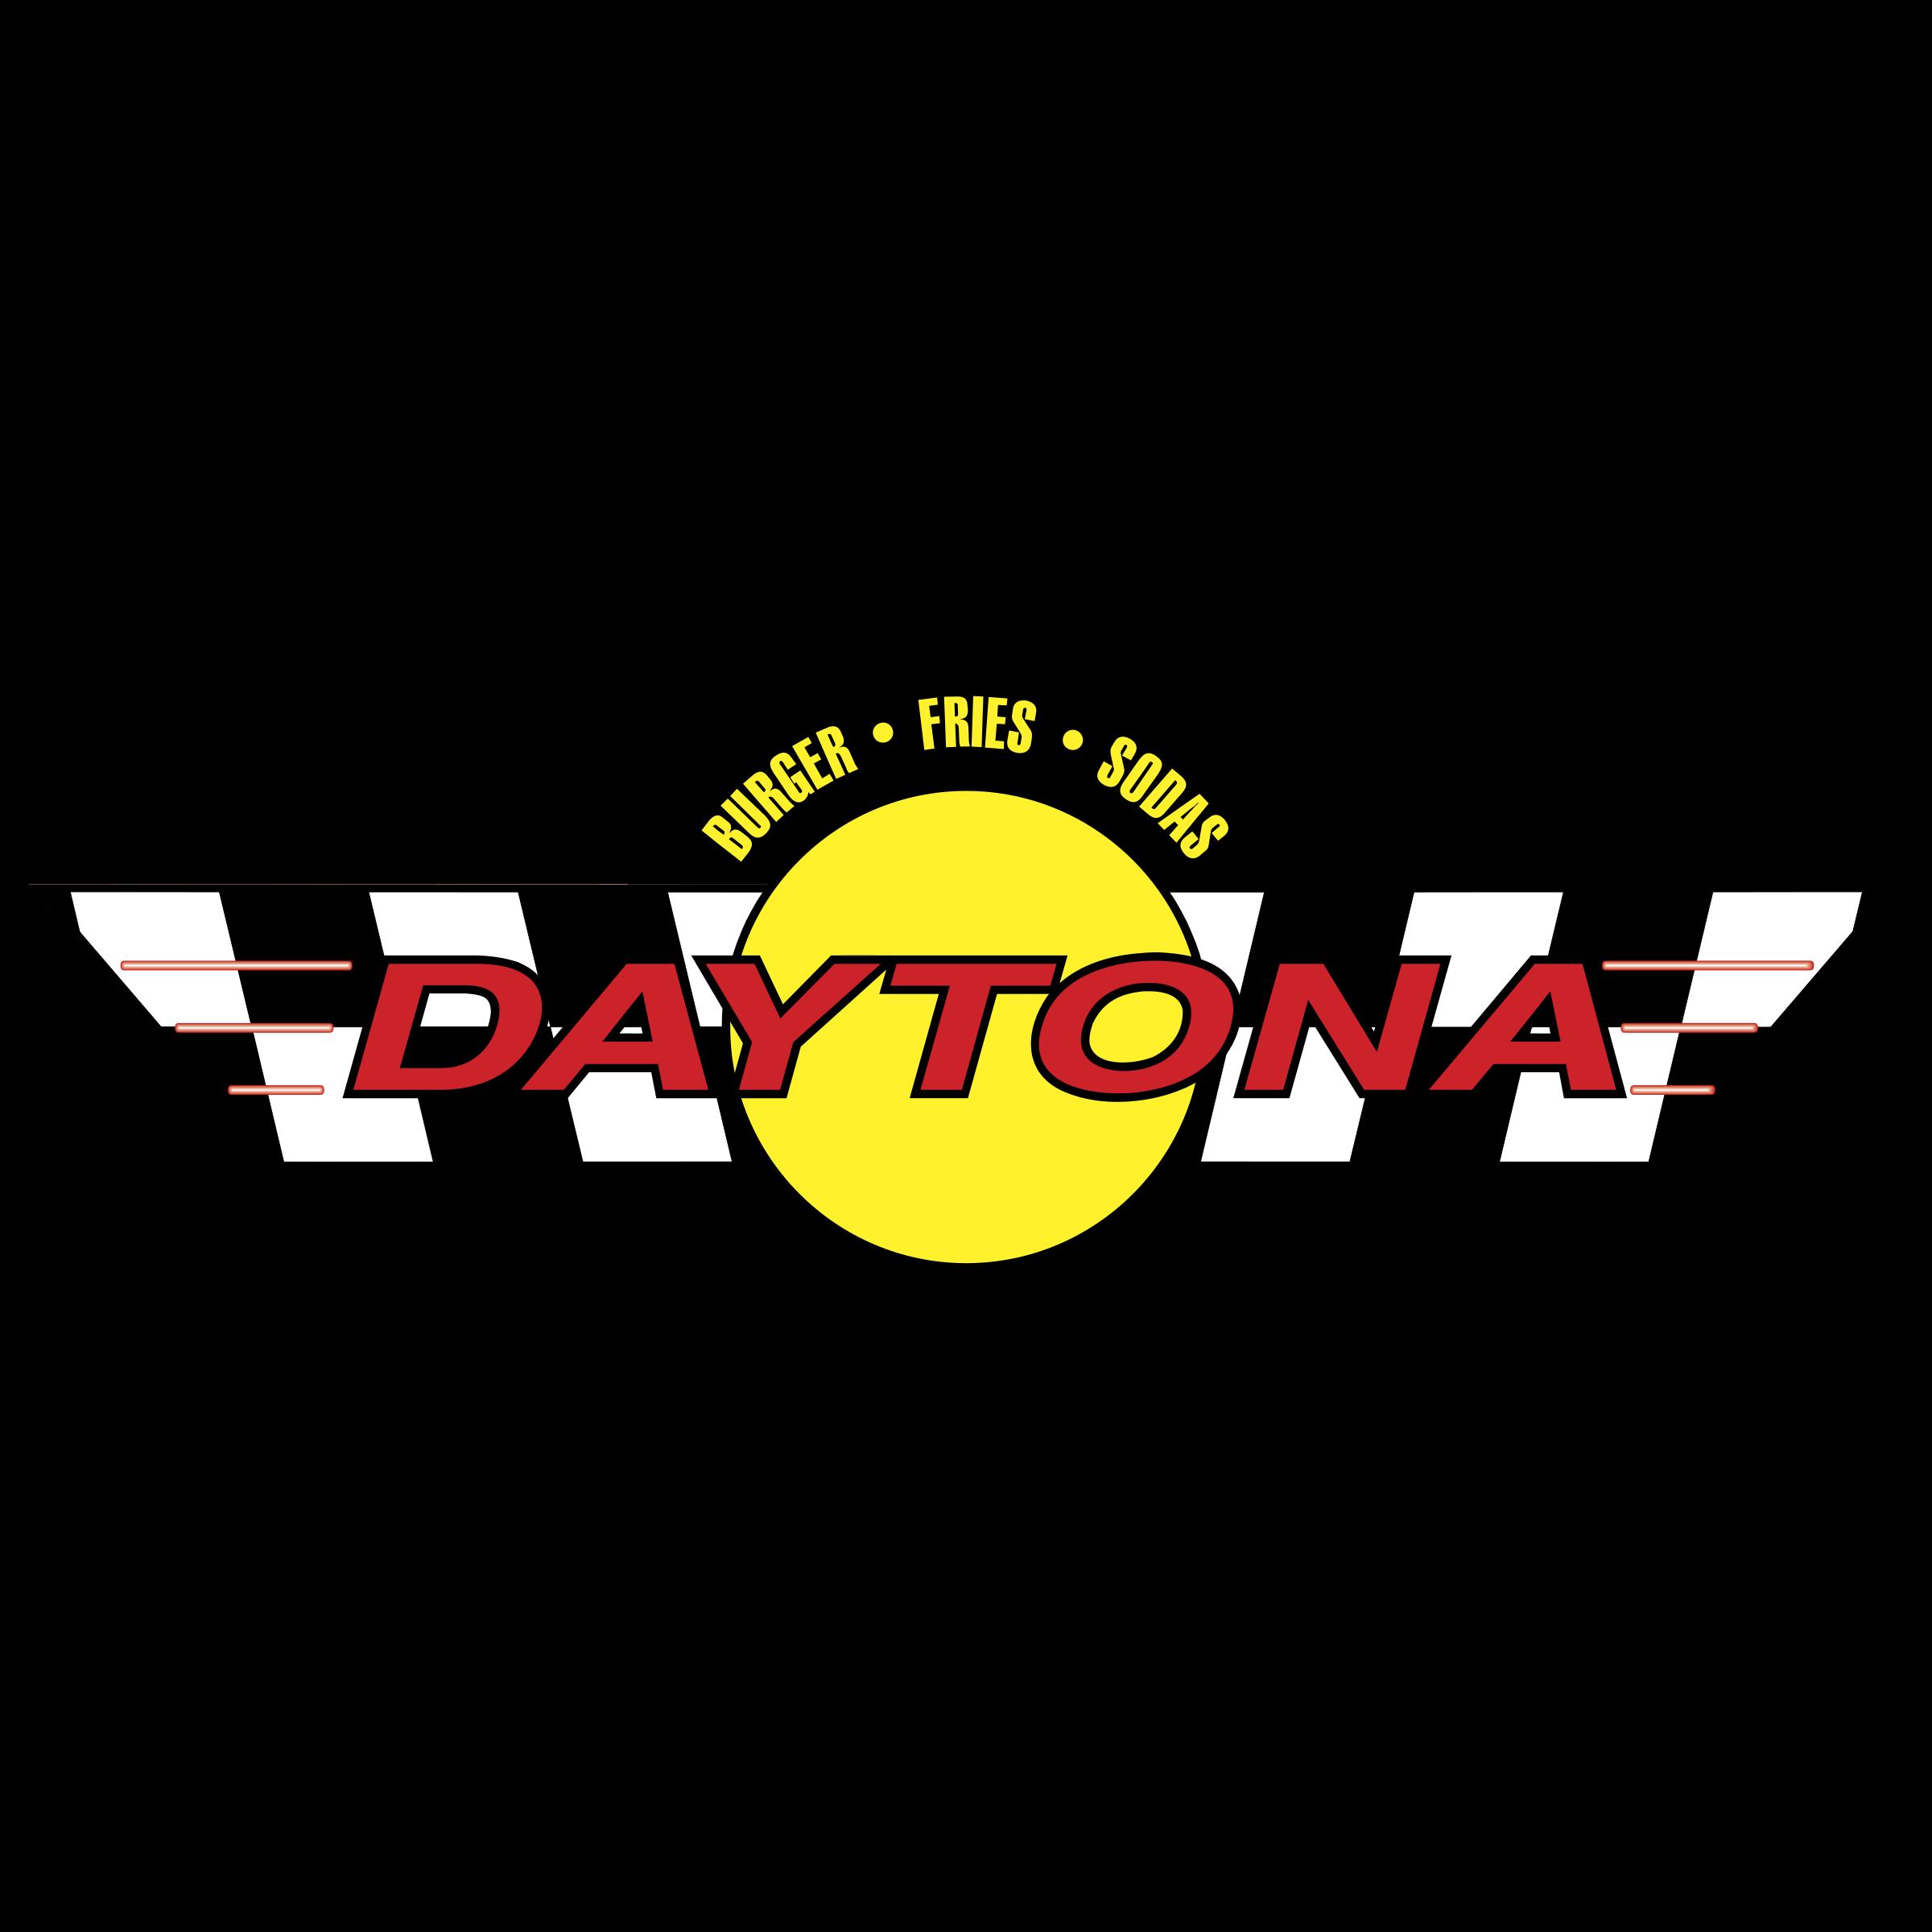 Daytona Logo PNG Transparent & SVG Vector.